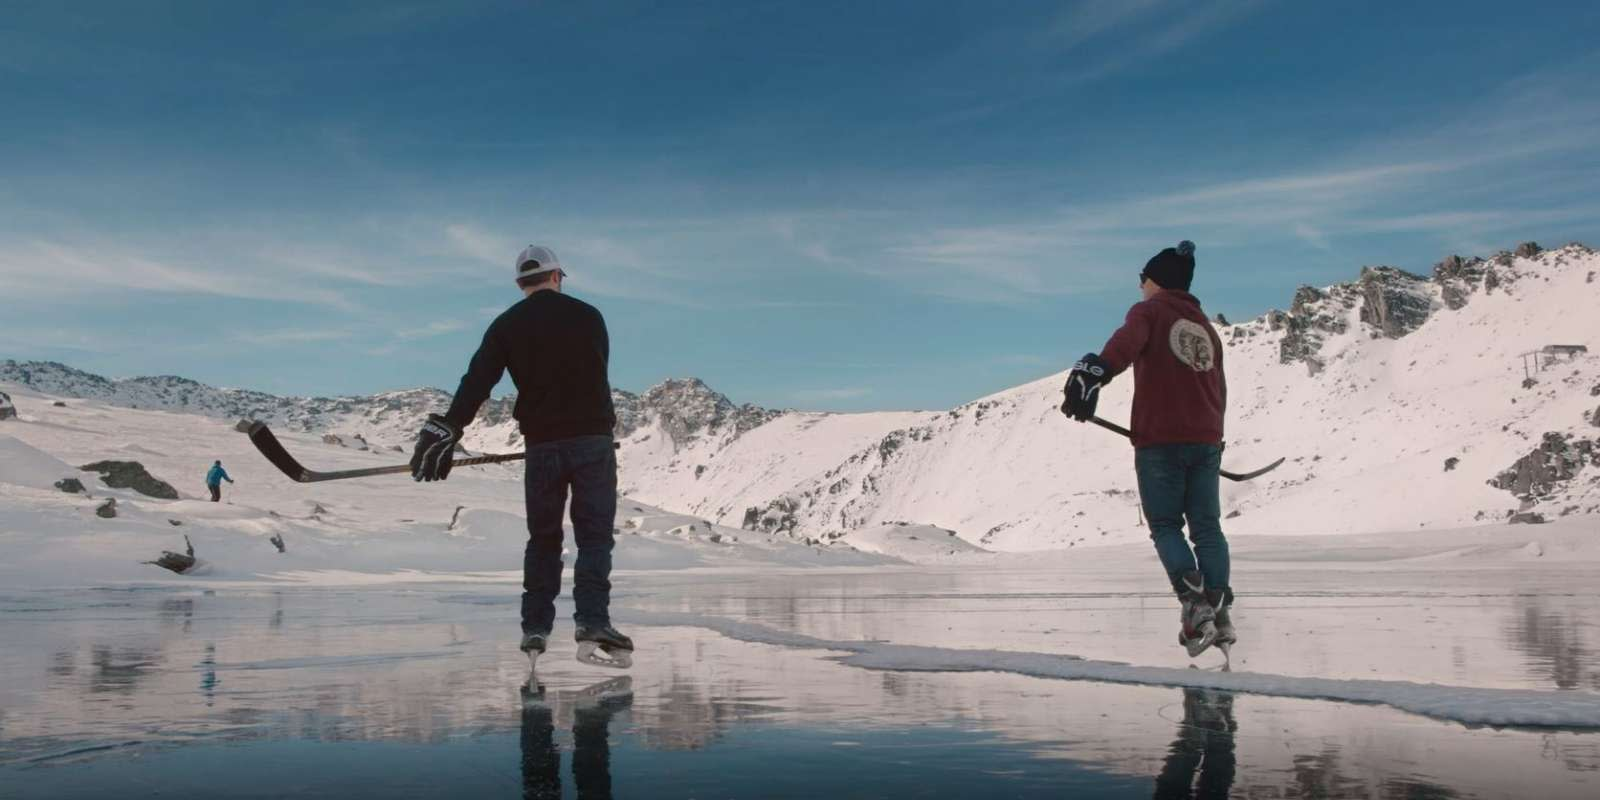 Ice skating on Lake Alta